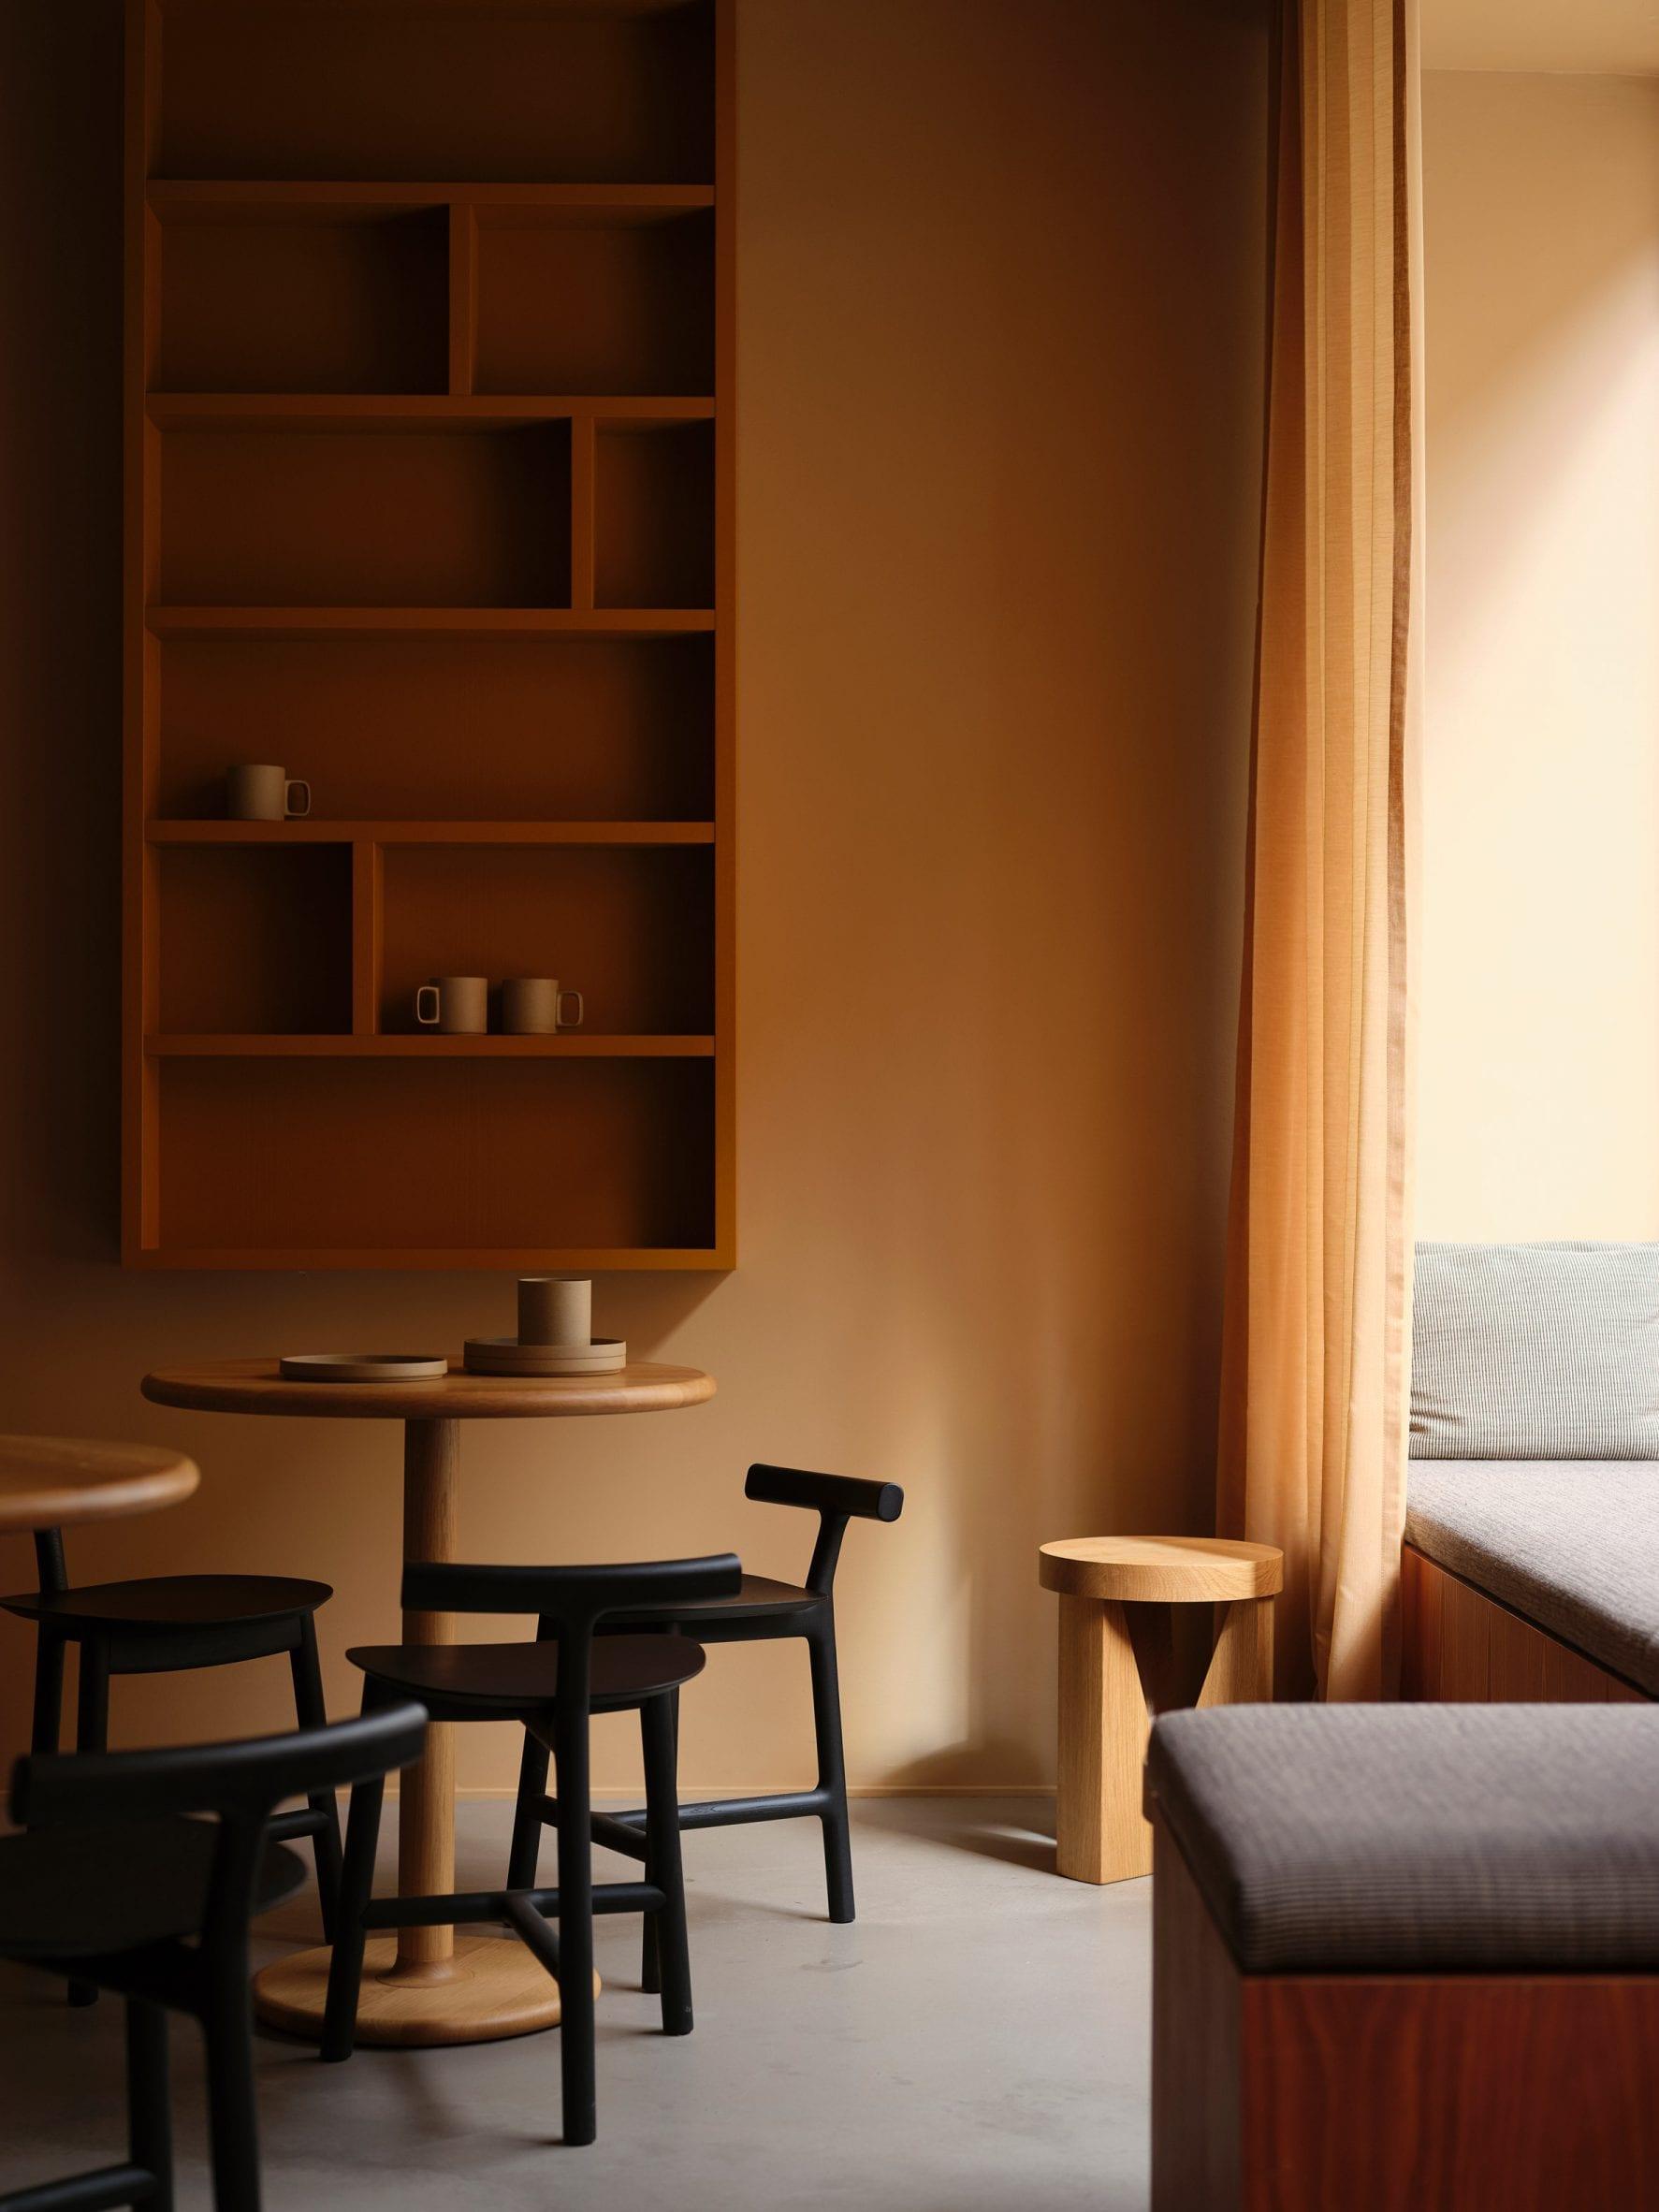 samsen atelier uses warm toned throughout the interior